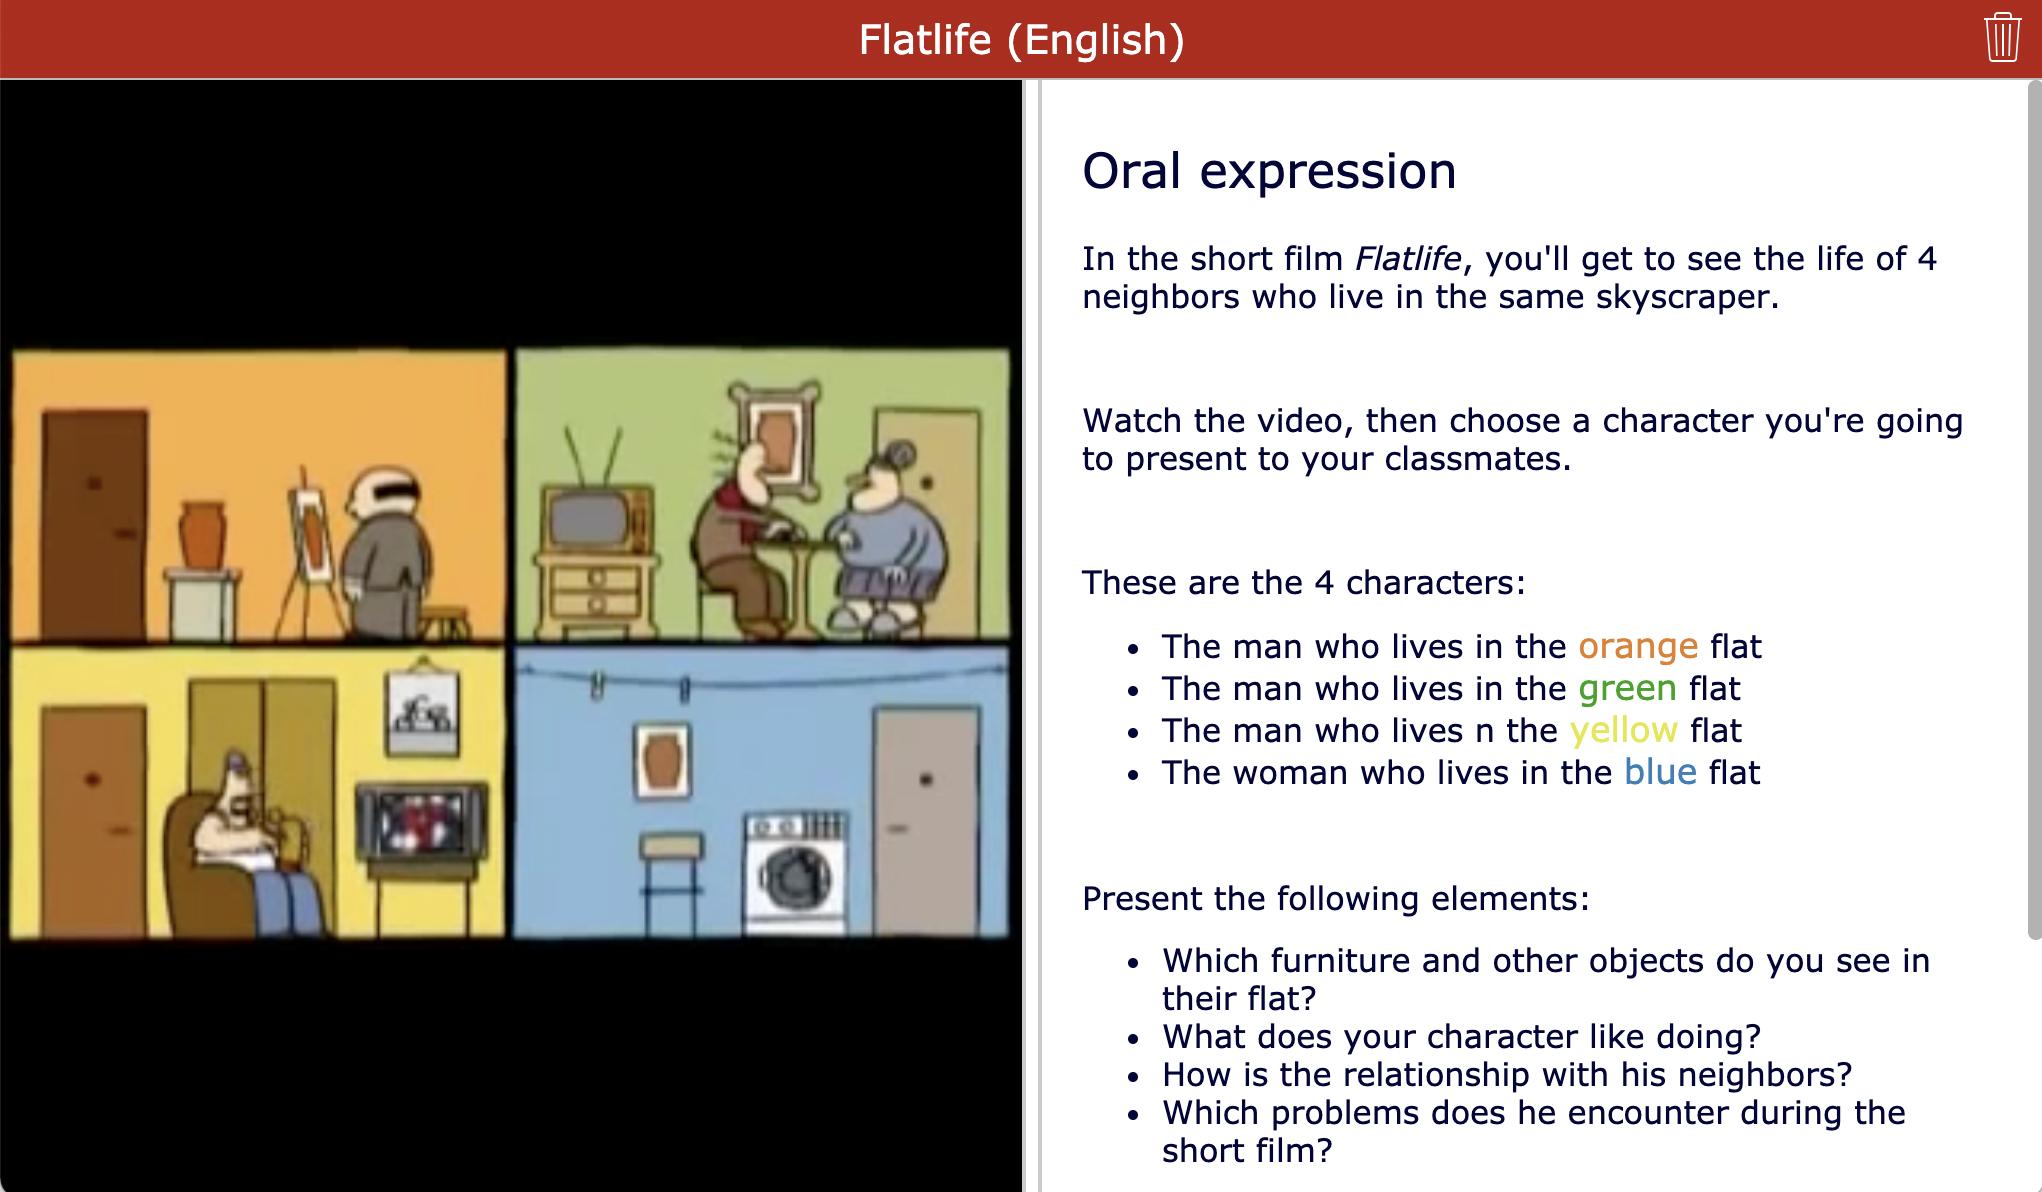 Short film - Flatlife - Oral expression lesson activity